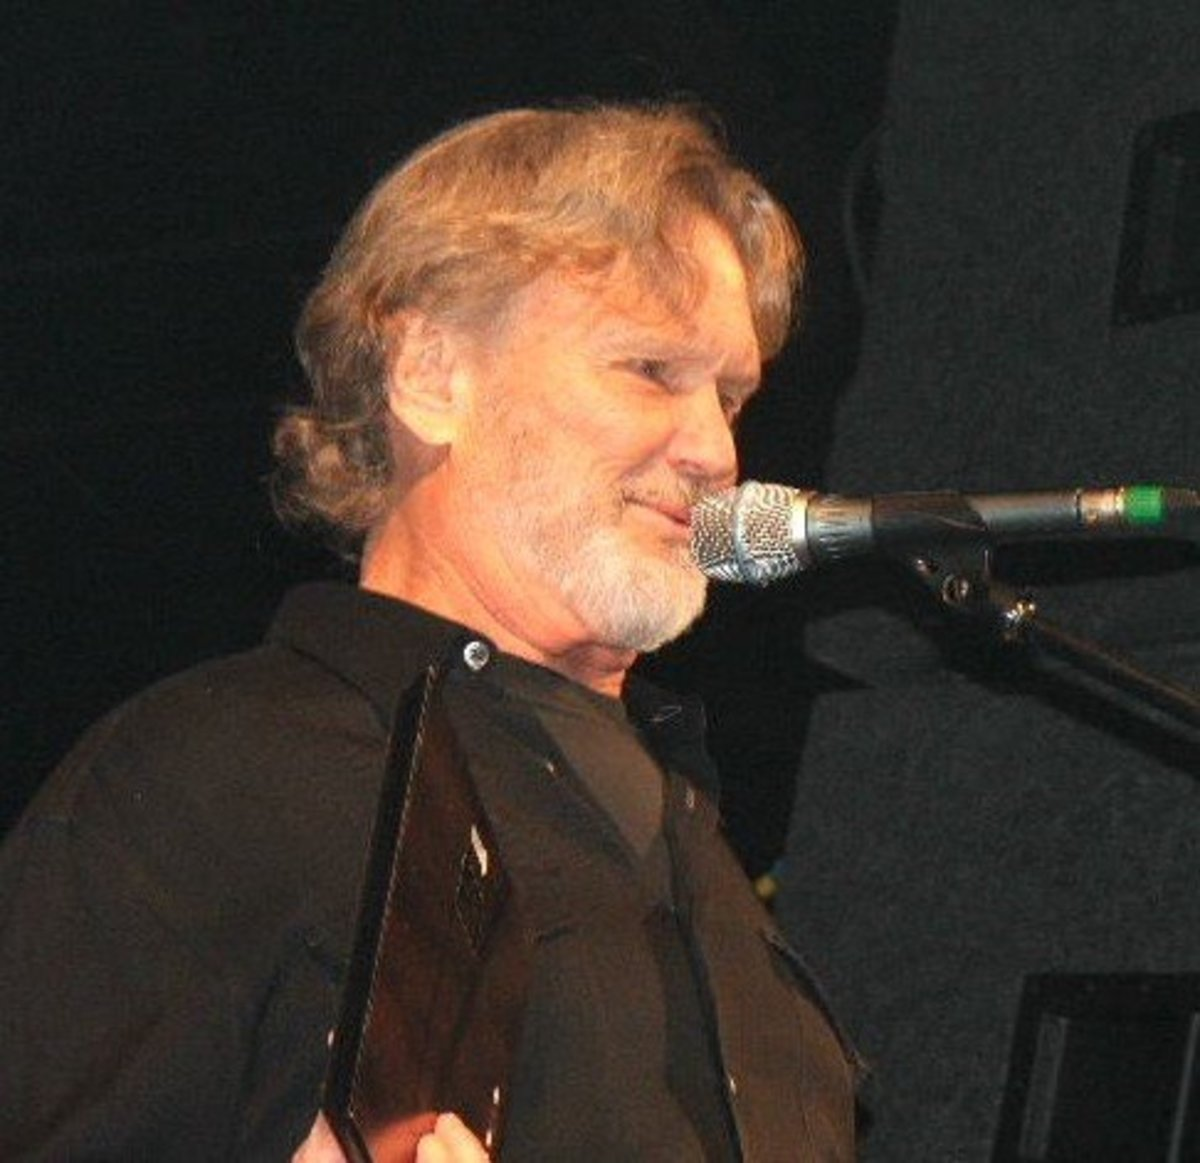 Kris Kristofferson, Songwriter, Singer, Actor